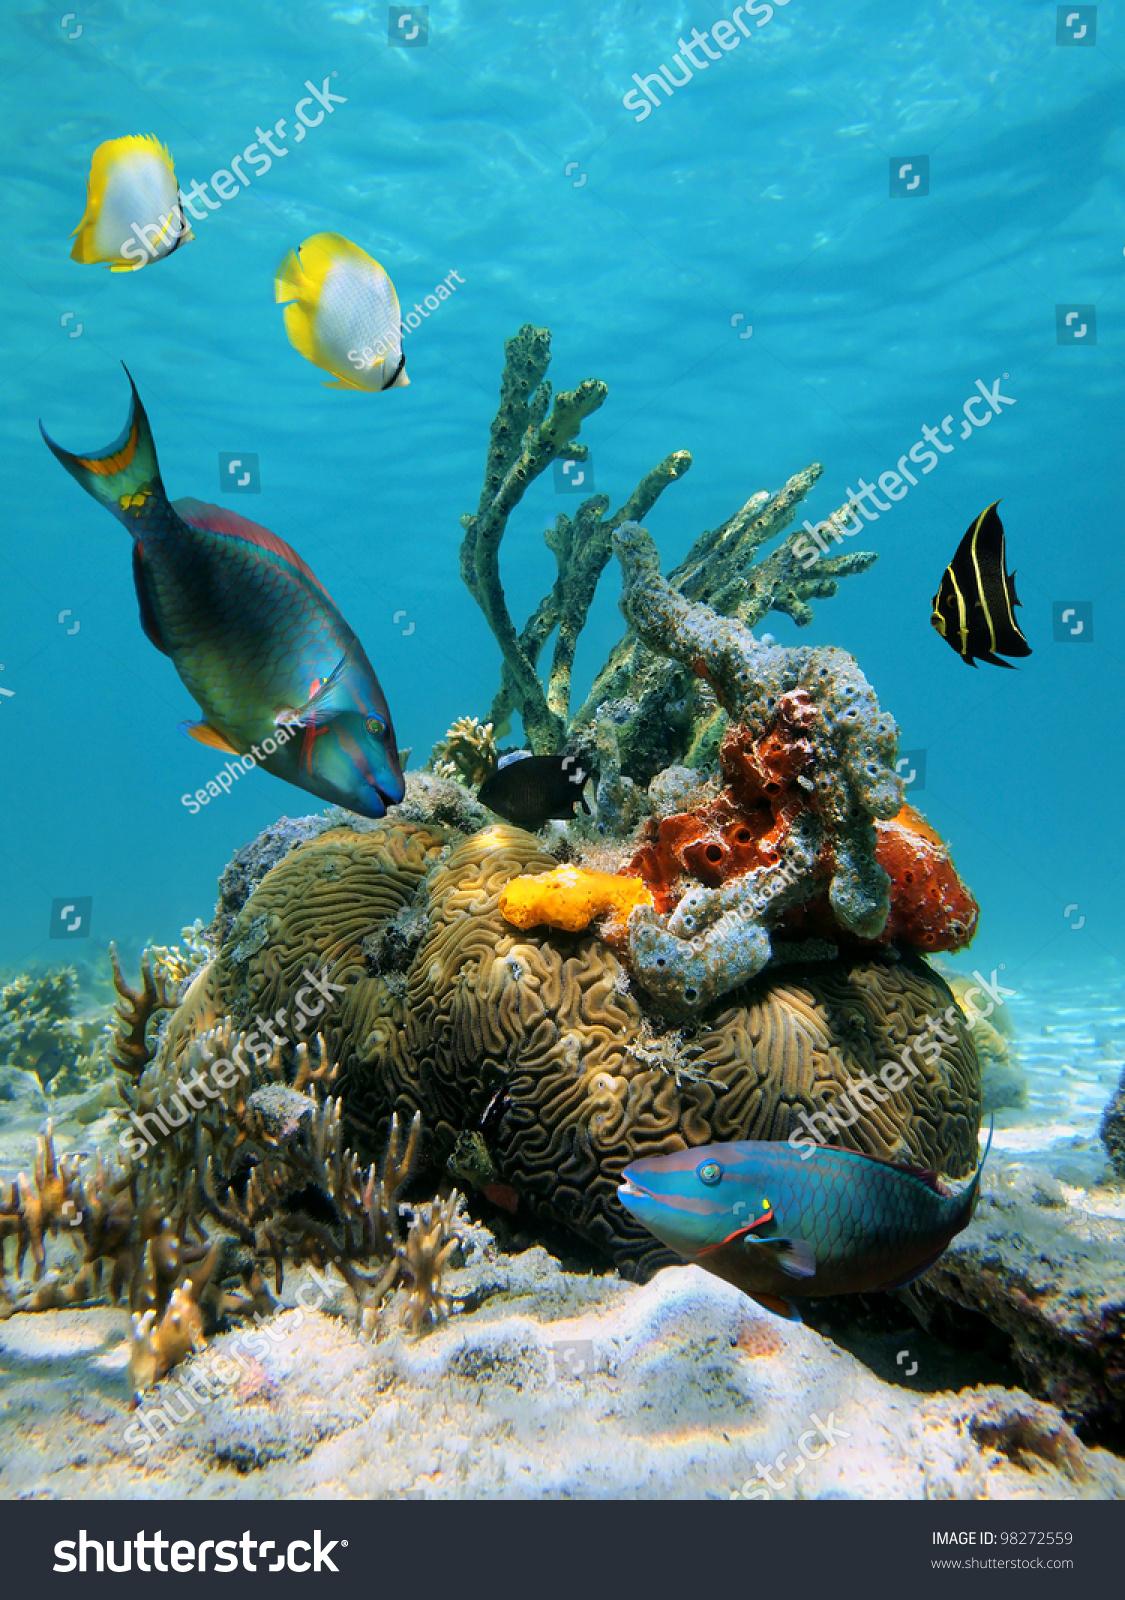 Wallpaper : sea, bay, beach, coast, palm trees, tropical ... |Ocean Life Plant Caribbean